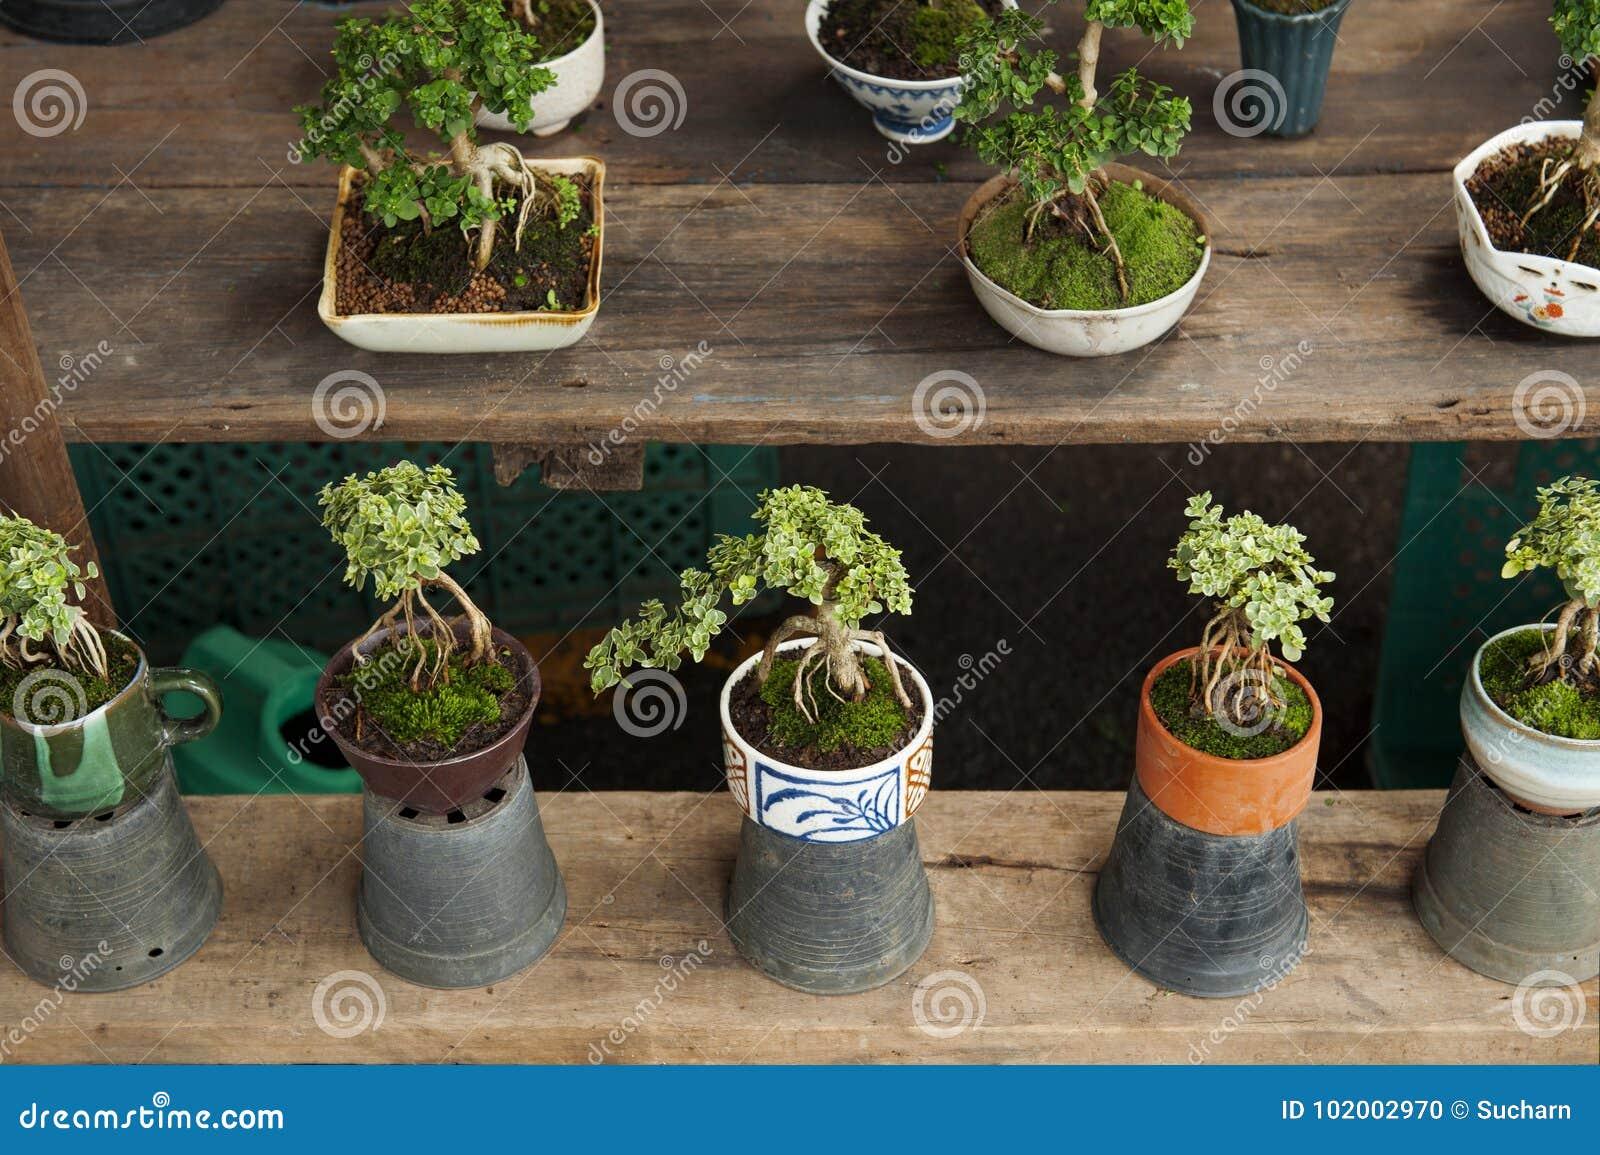 Bonsai Tree For Mini Garden In Shop At Tree Market Stock Photo